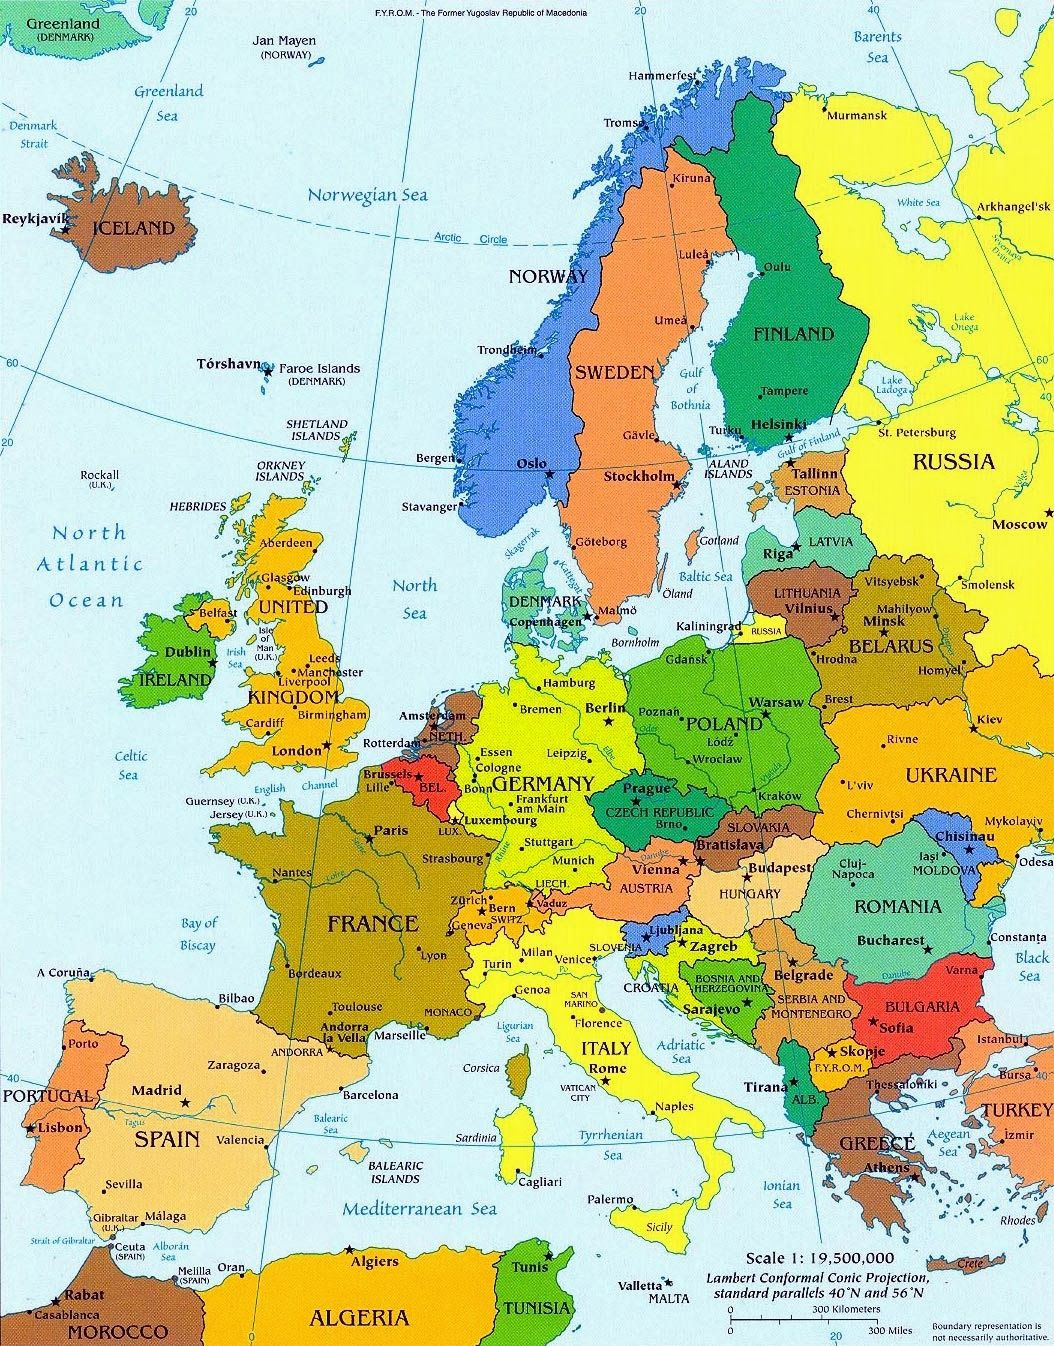 england deutschland karte landkaart europa   Google zoeken | Europe map, Political map